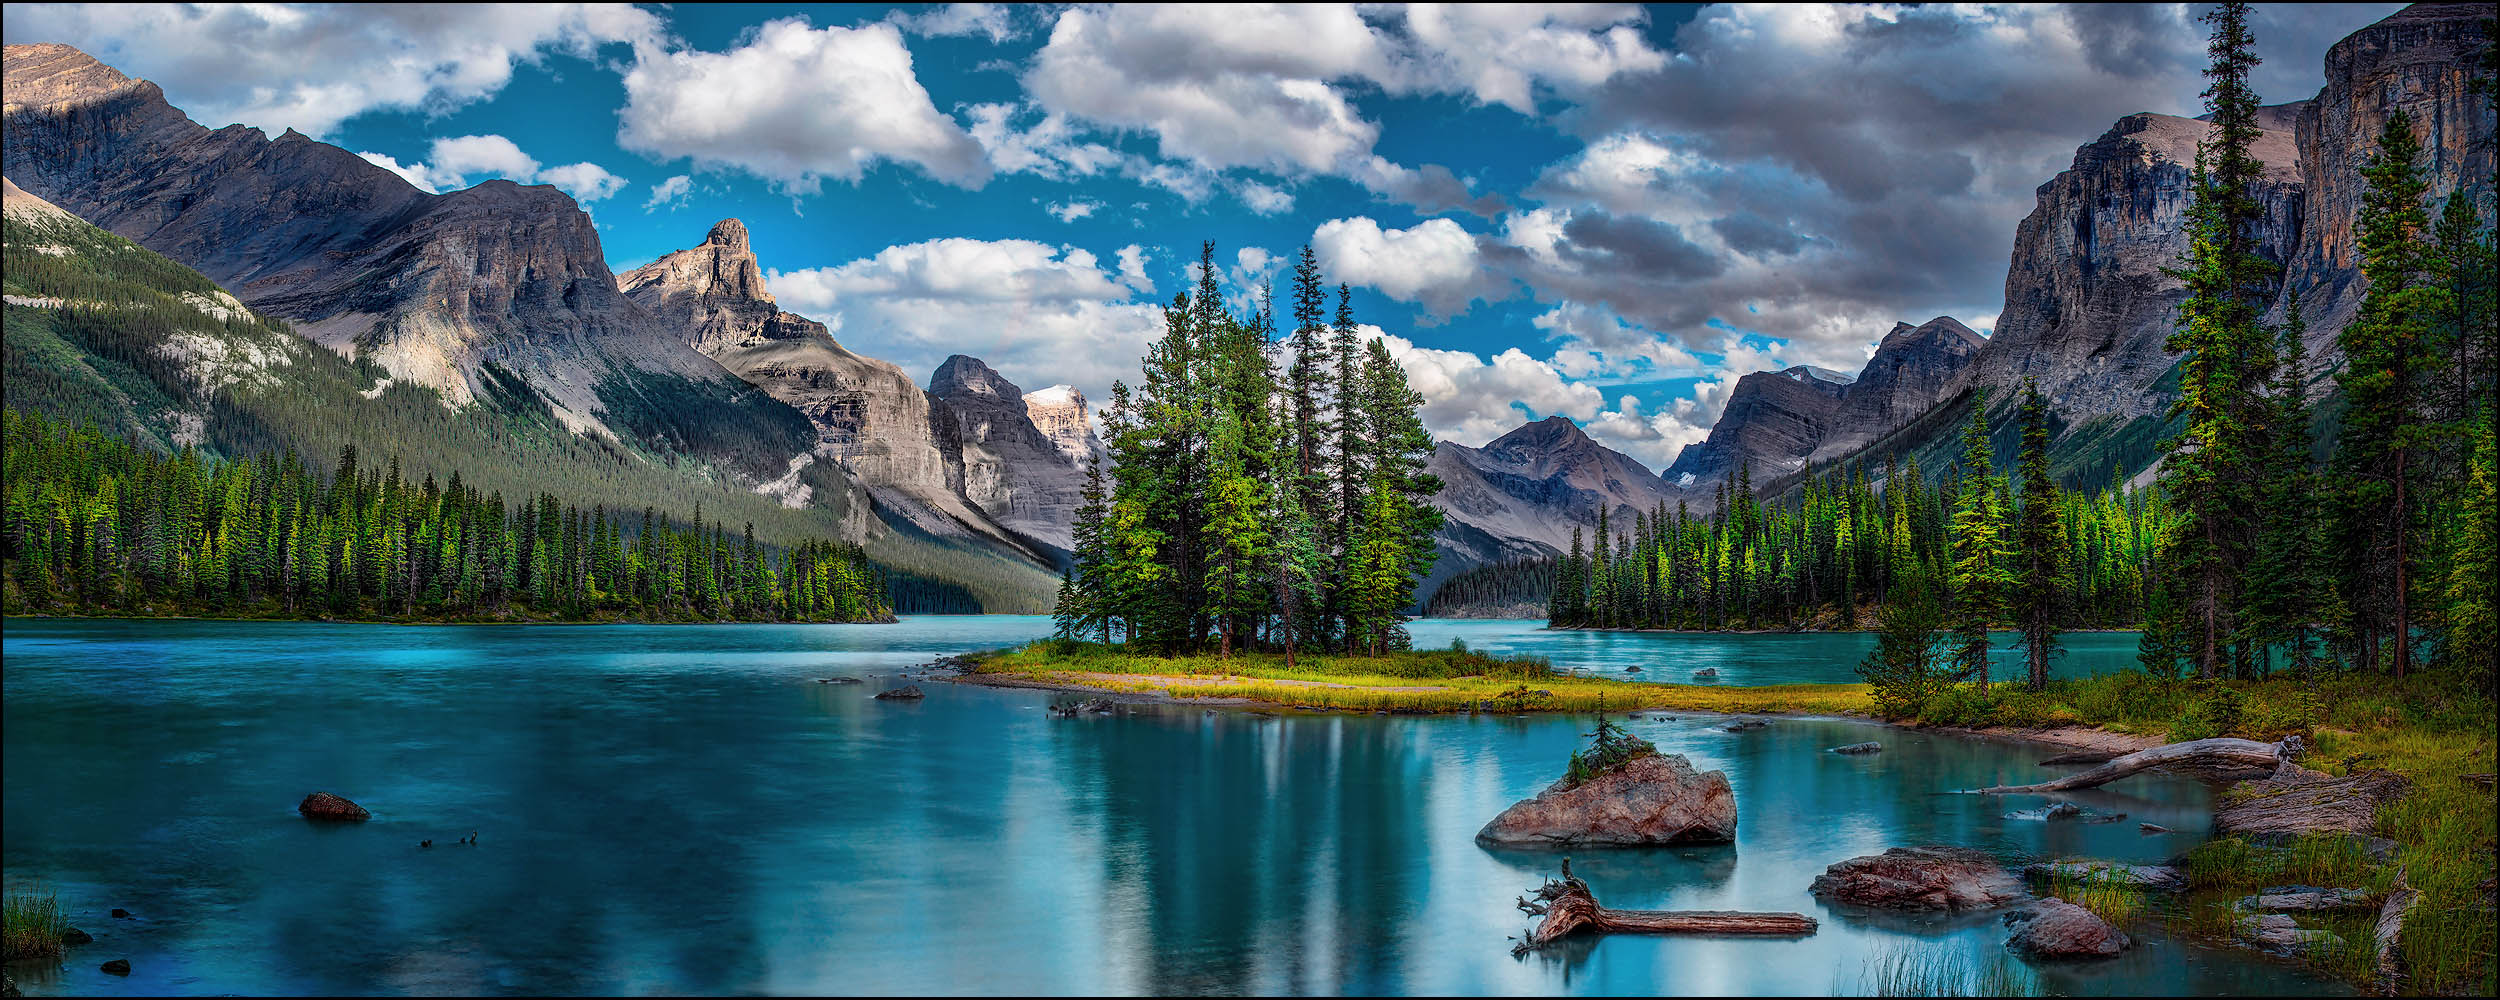 The Spirit Island in Jasper National Park